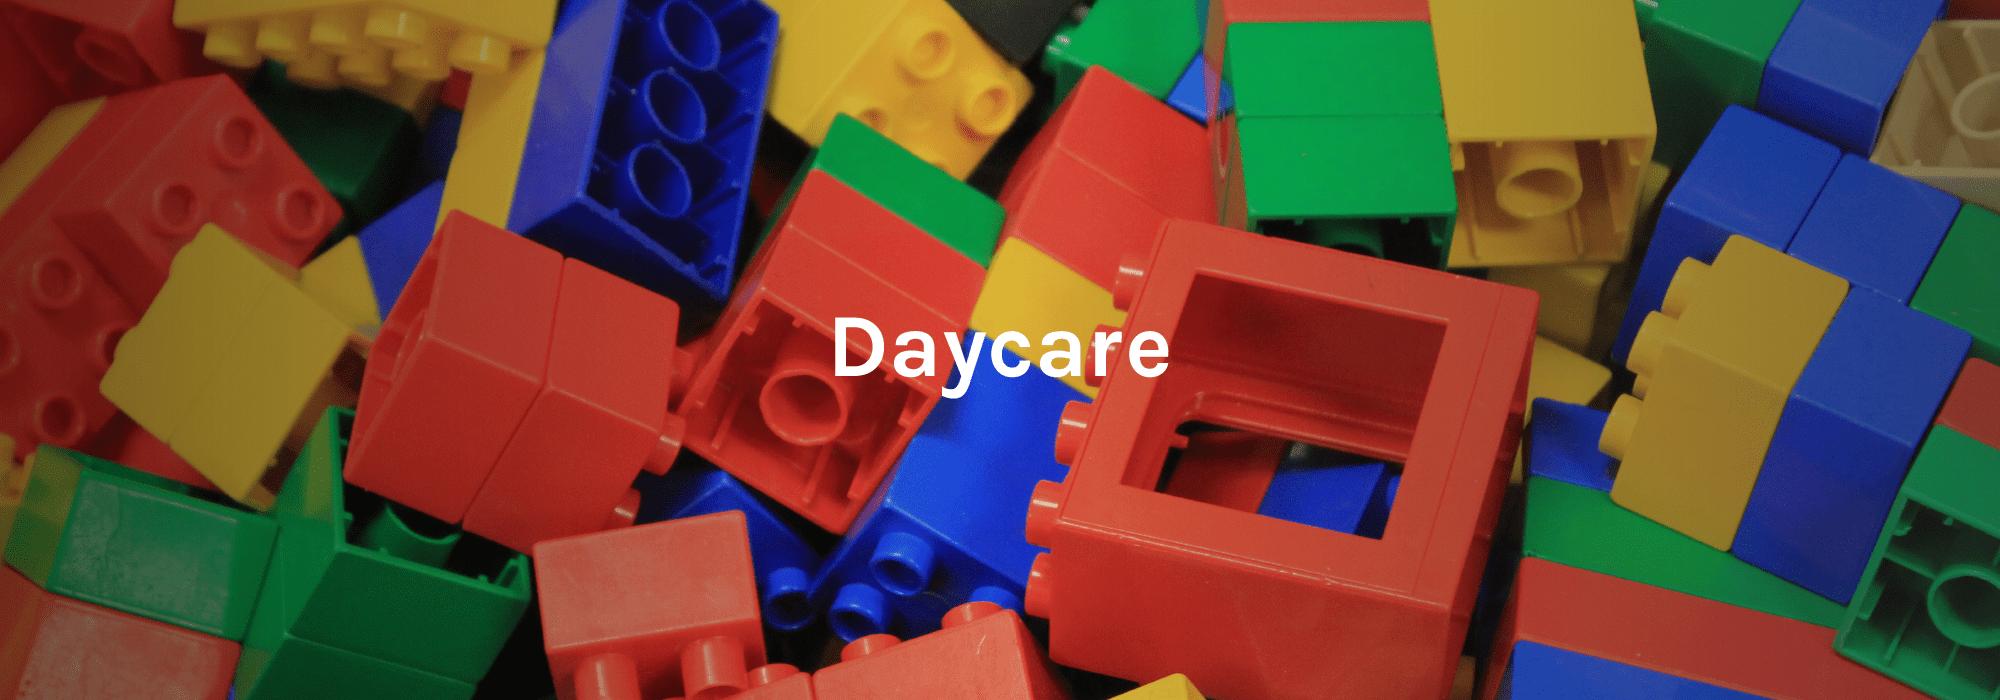 daycare banner